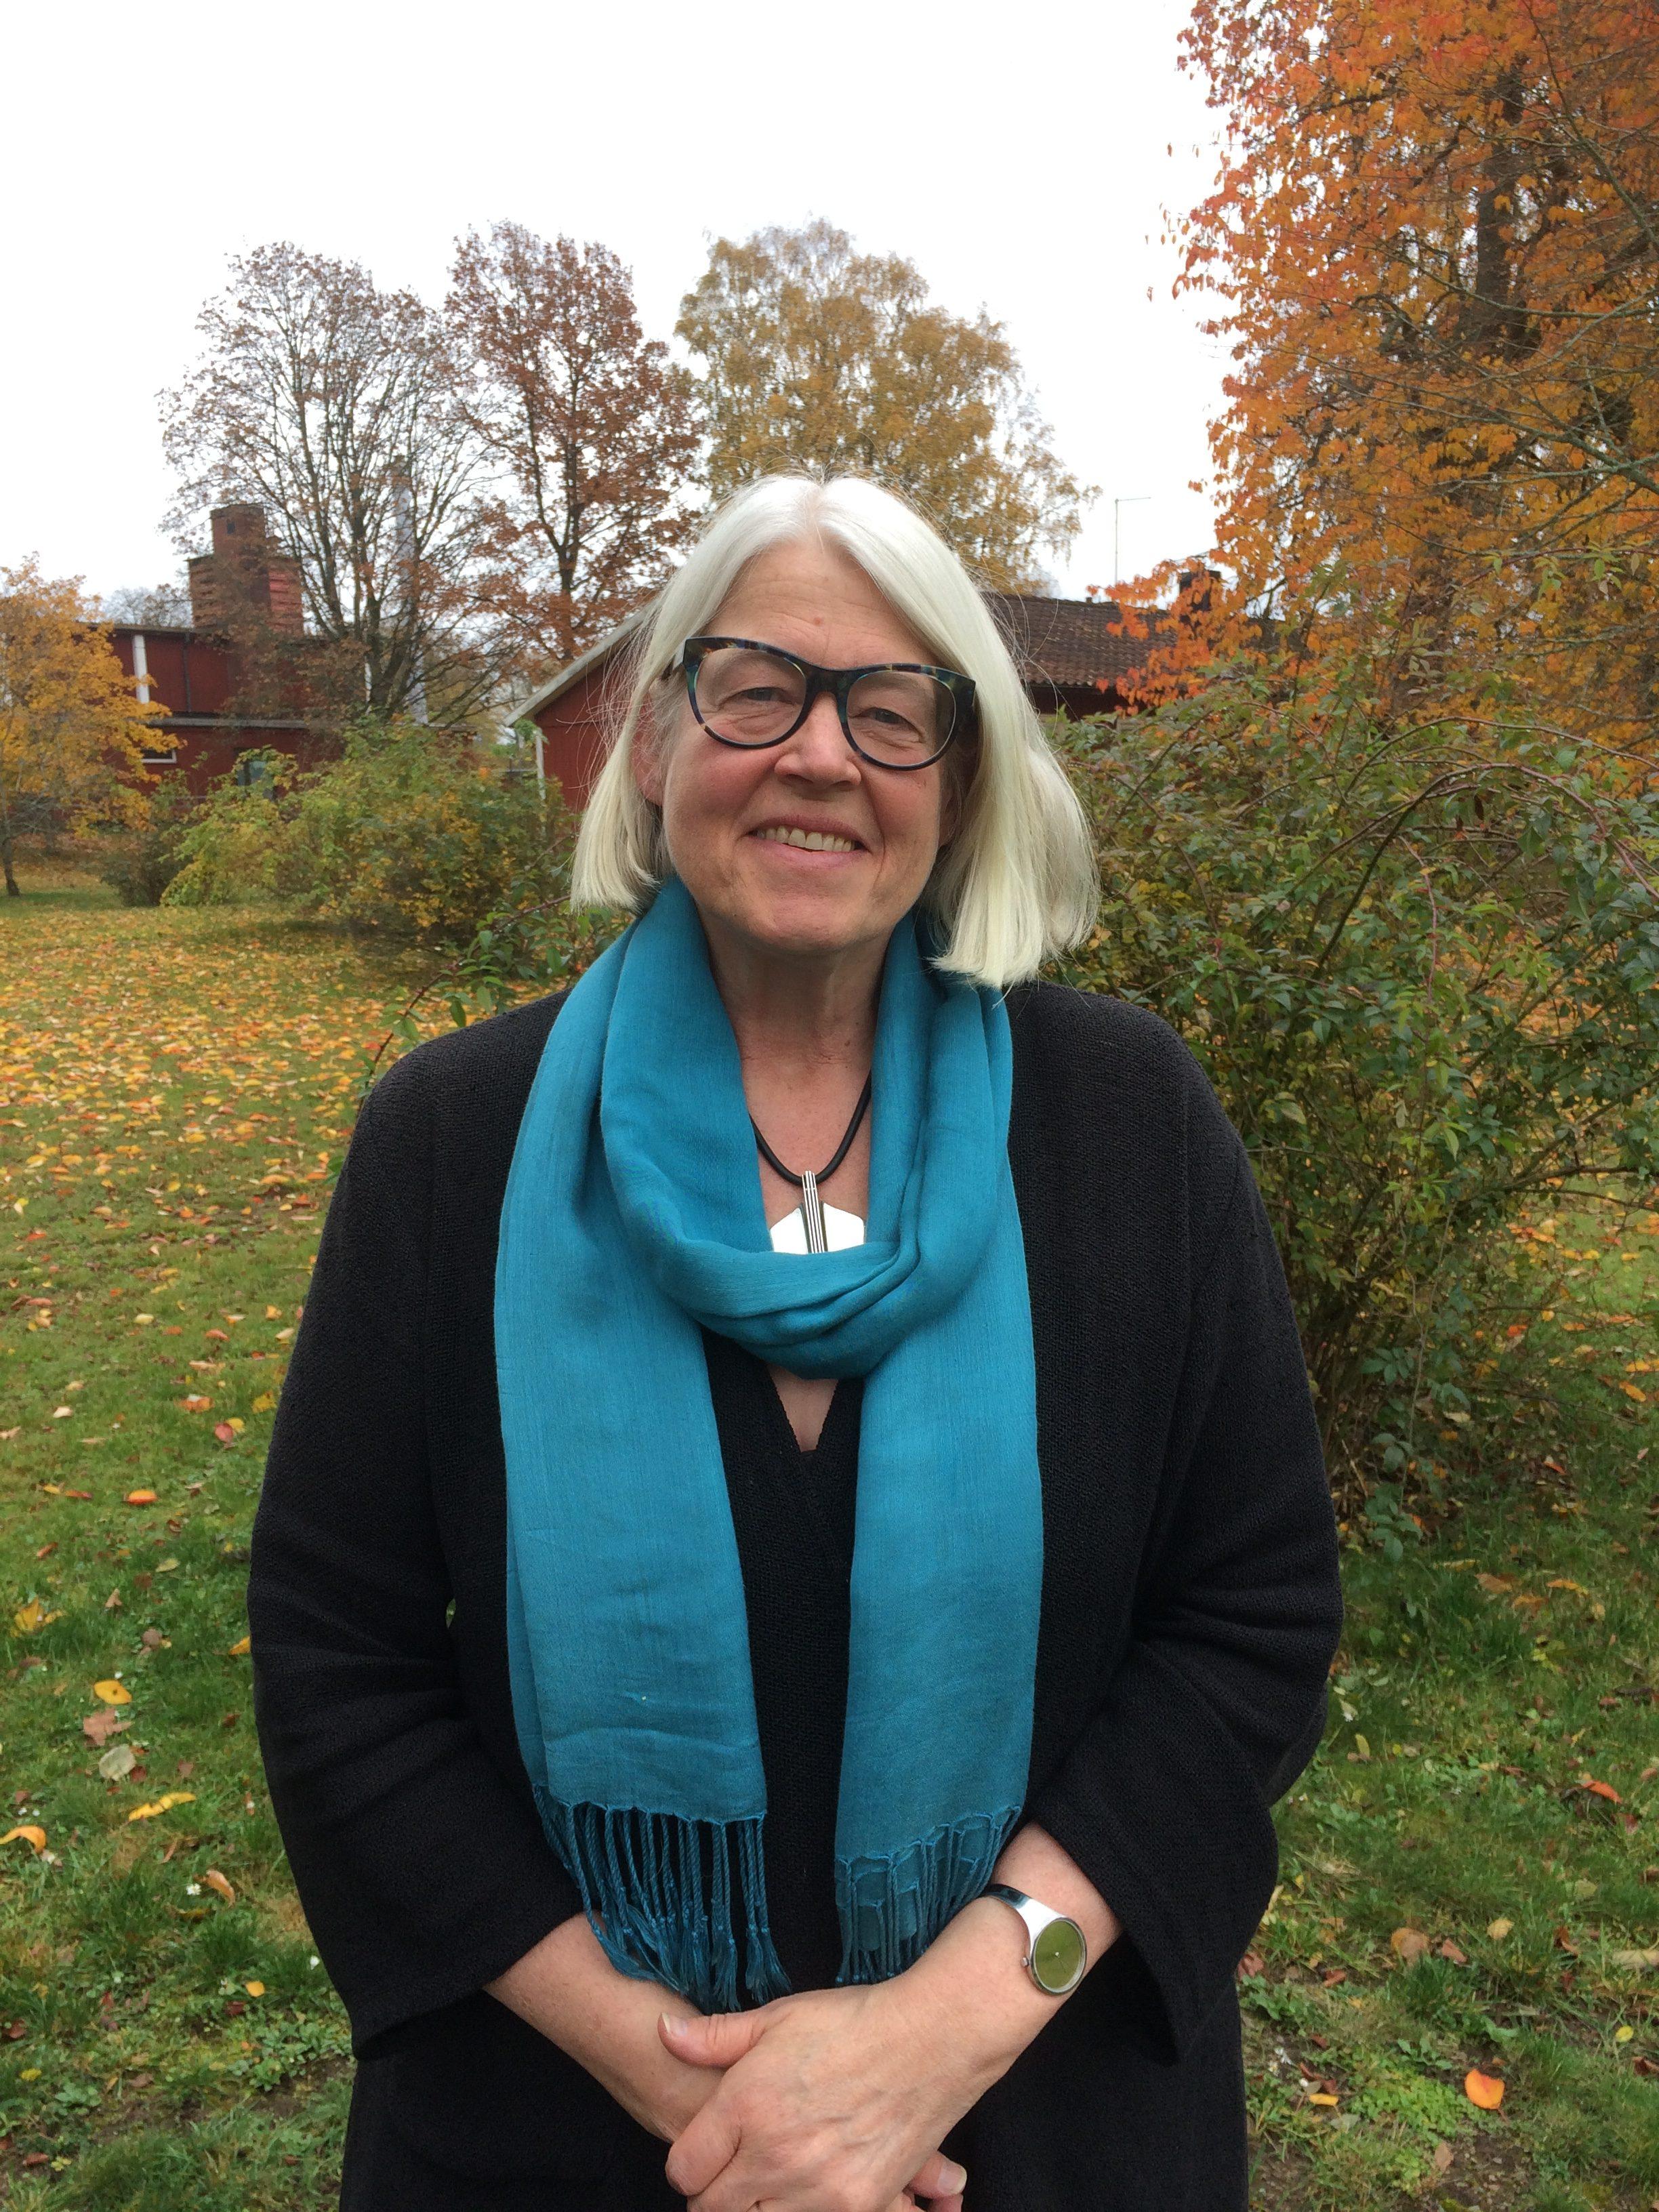 Ulrika Knutson